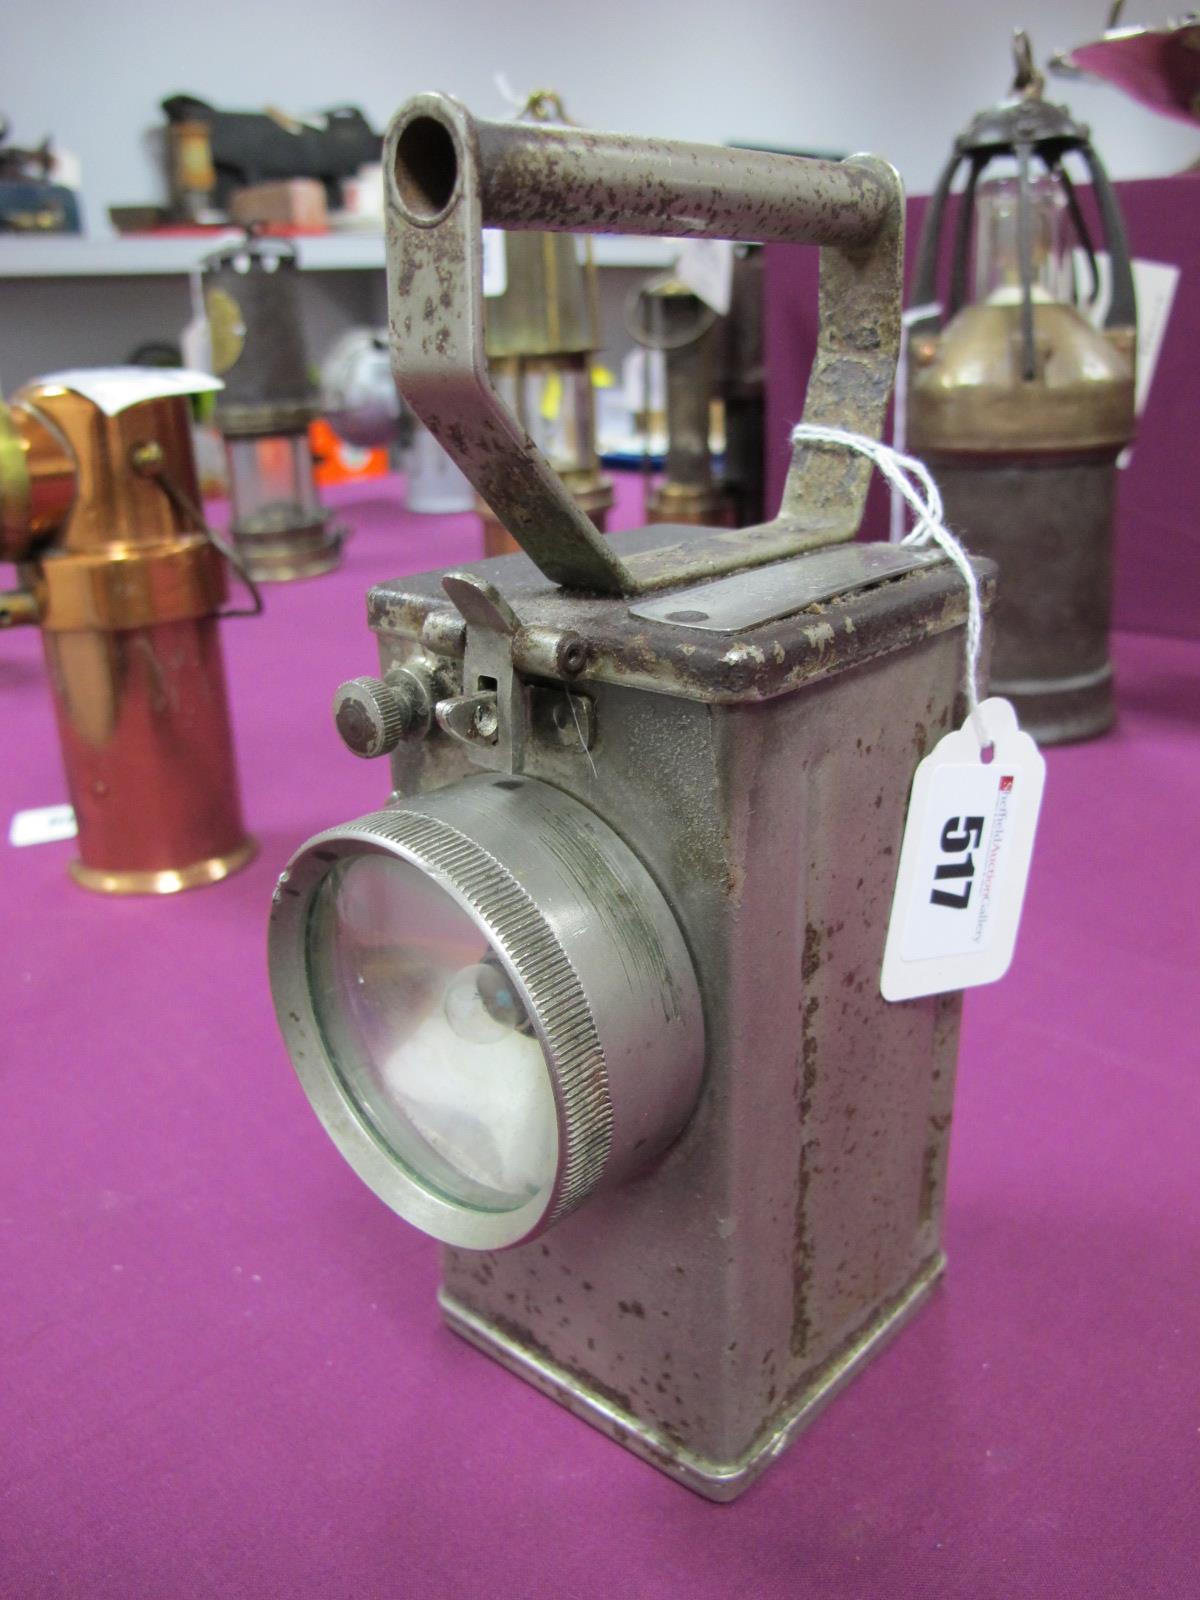 Nife of Redditch Type NH10 Miners Lamp, circa 1940, having metal horizontal carry handle, 20cm